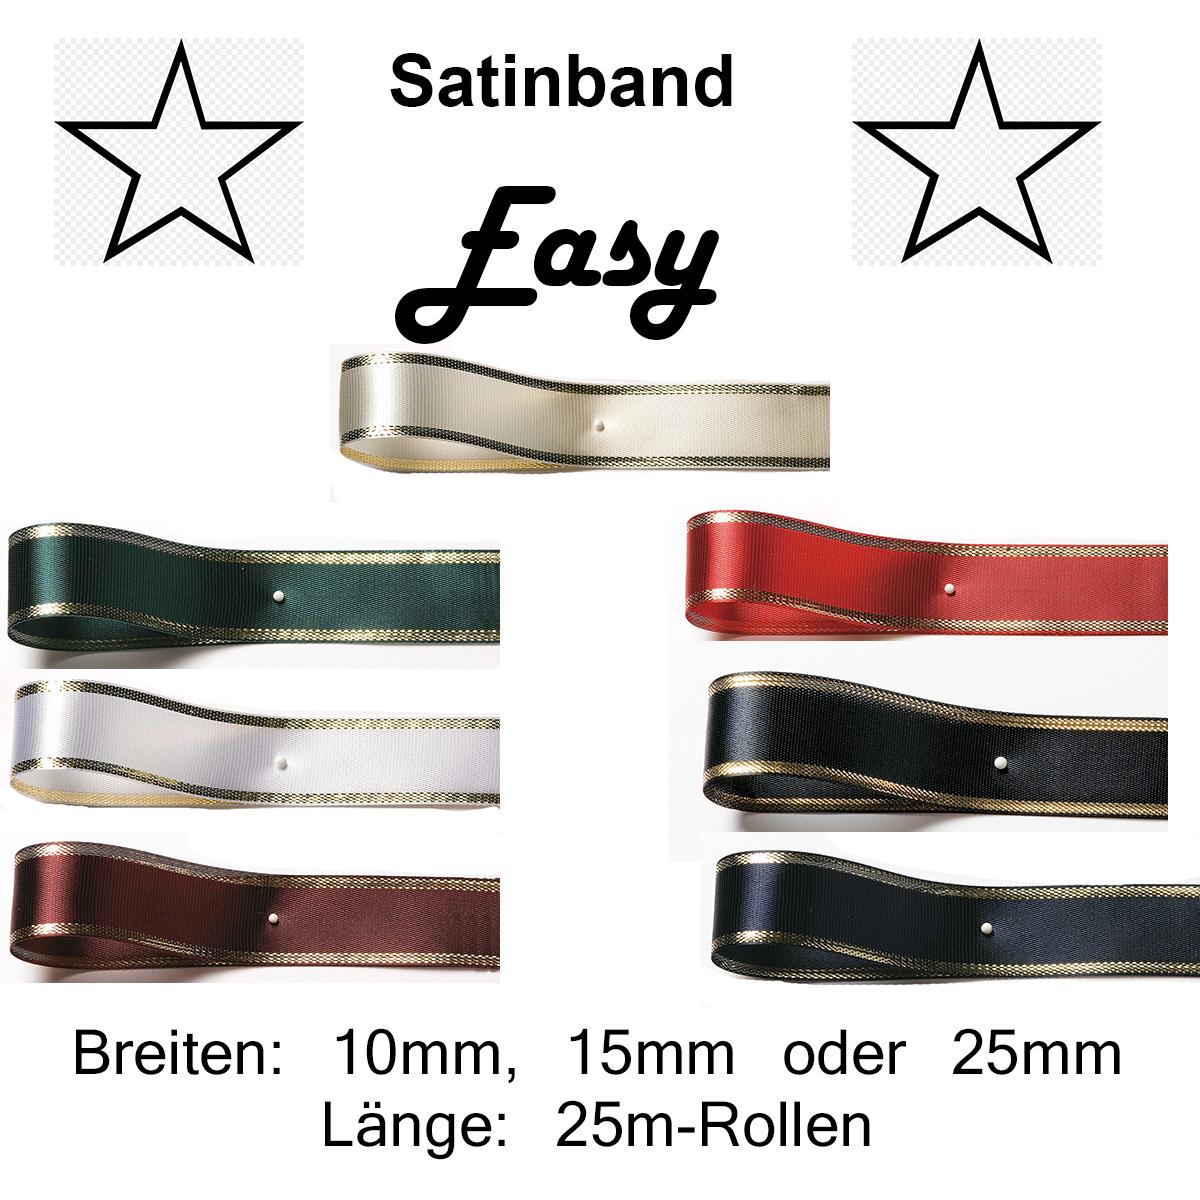 NEU Satinband creme 15mm x 25m